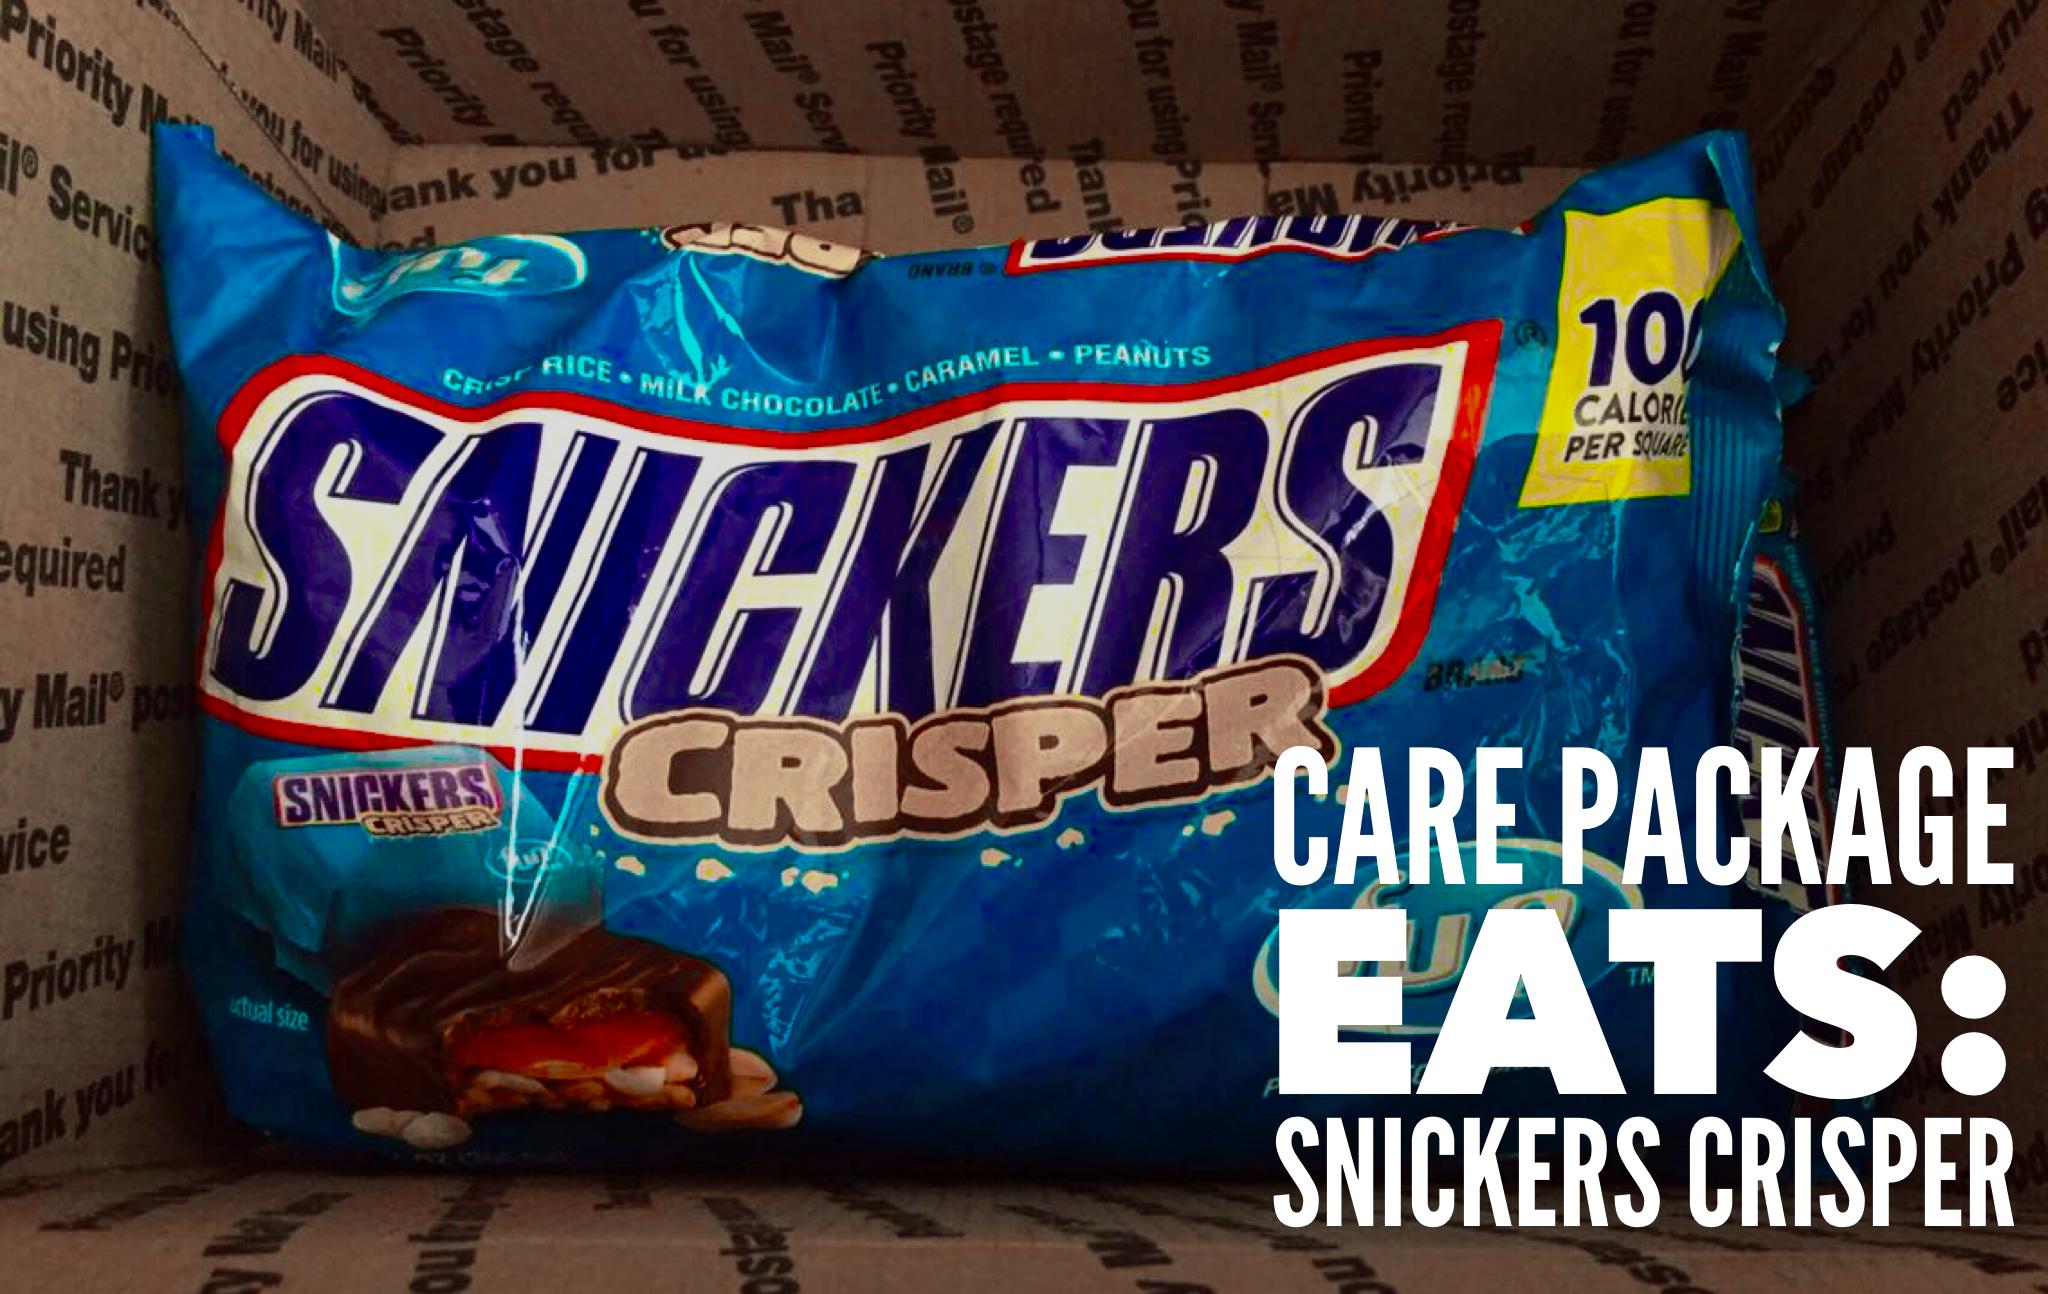 Care Package Eats: Snickers Crisper